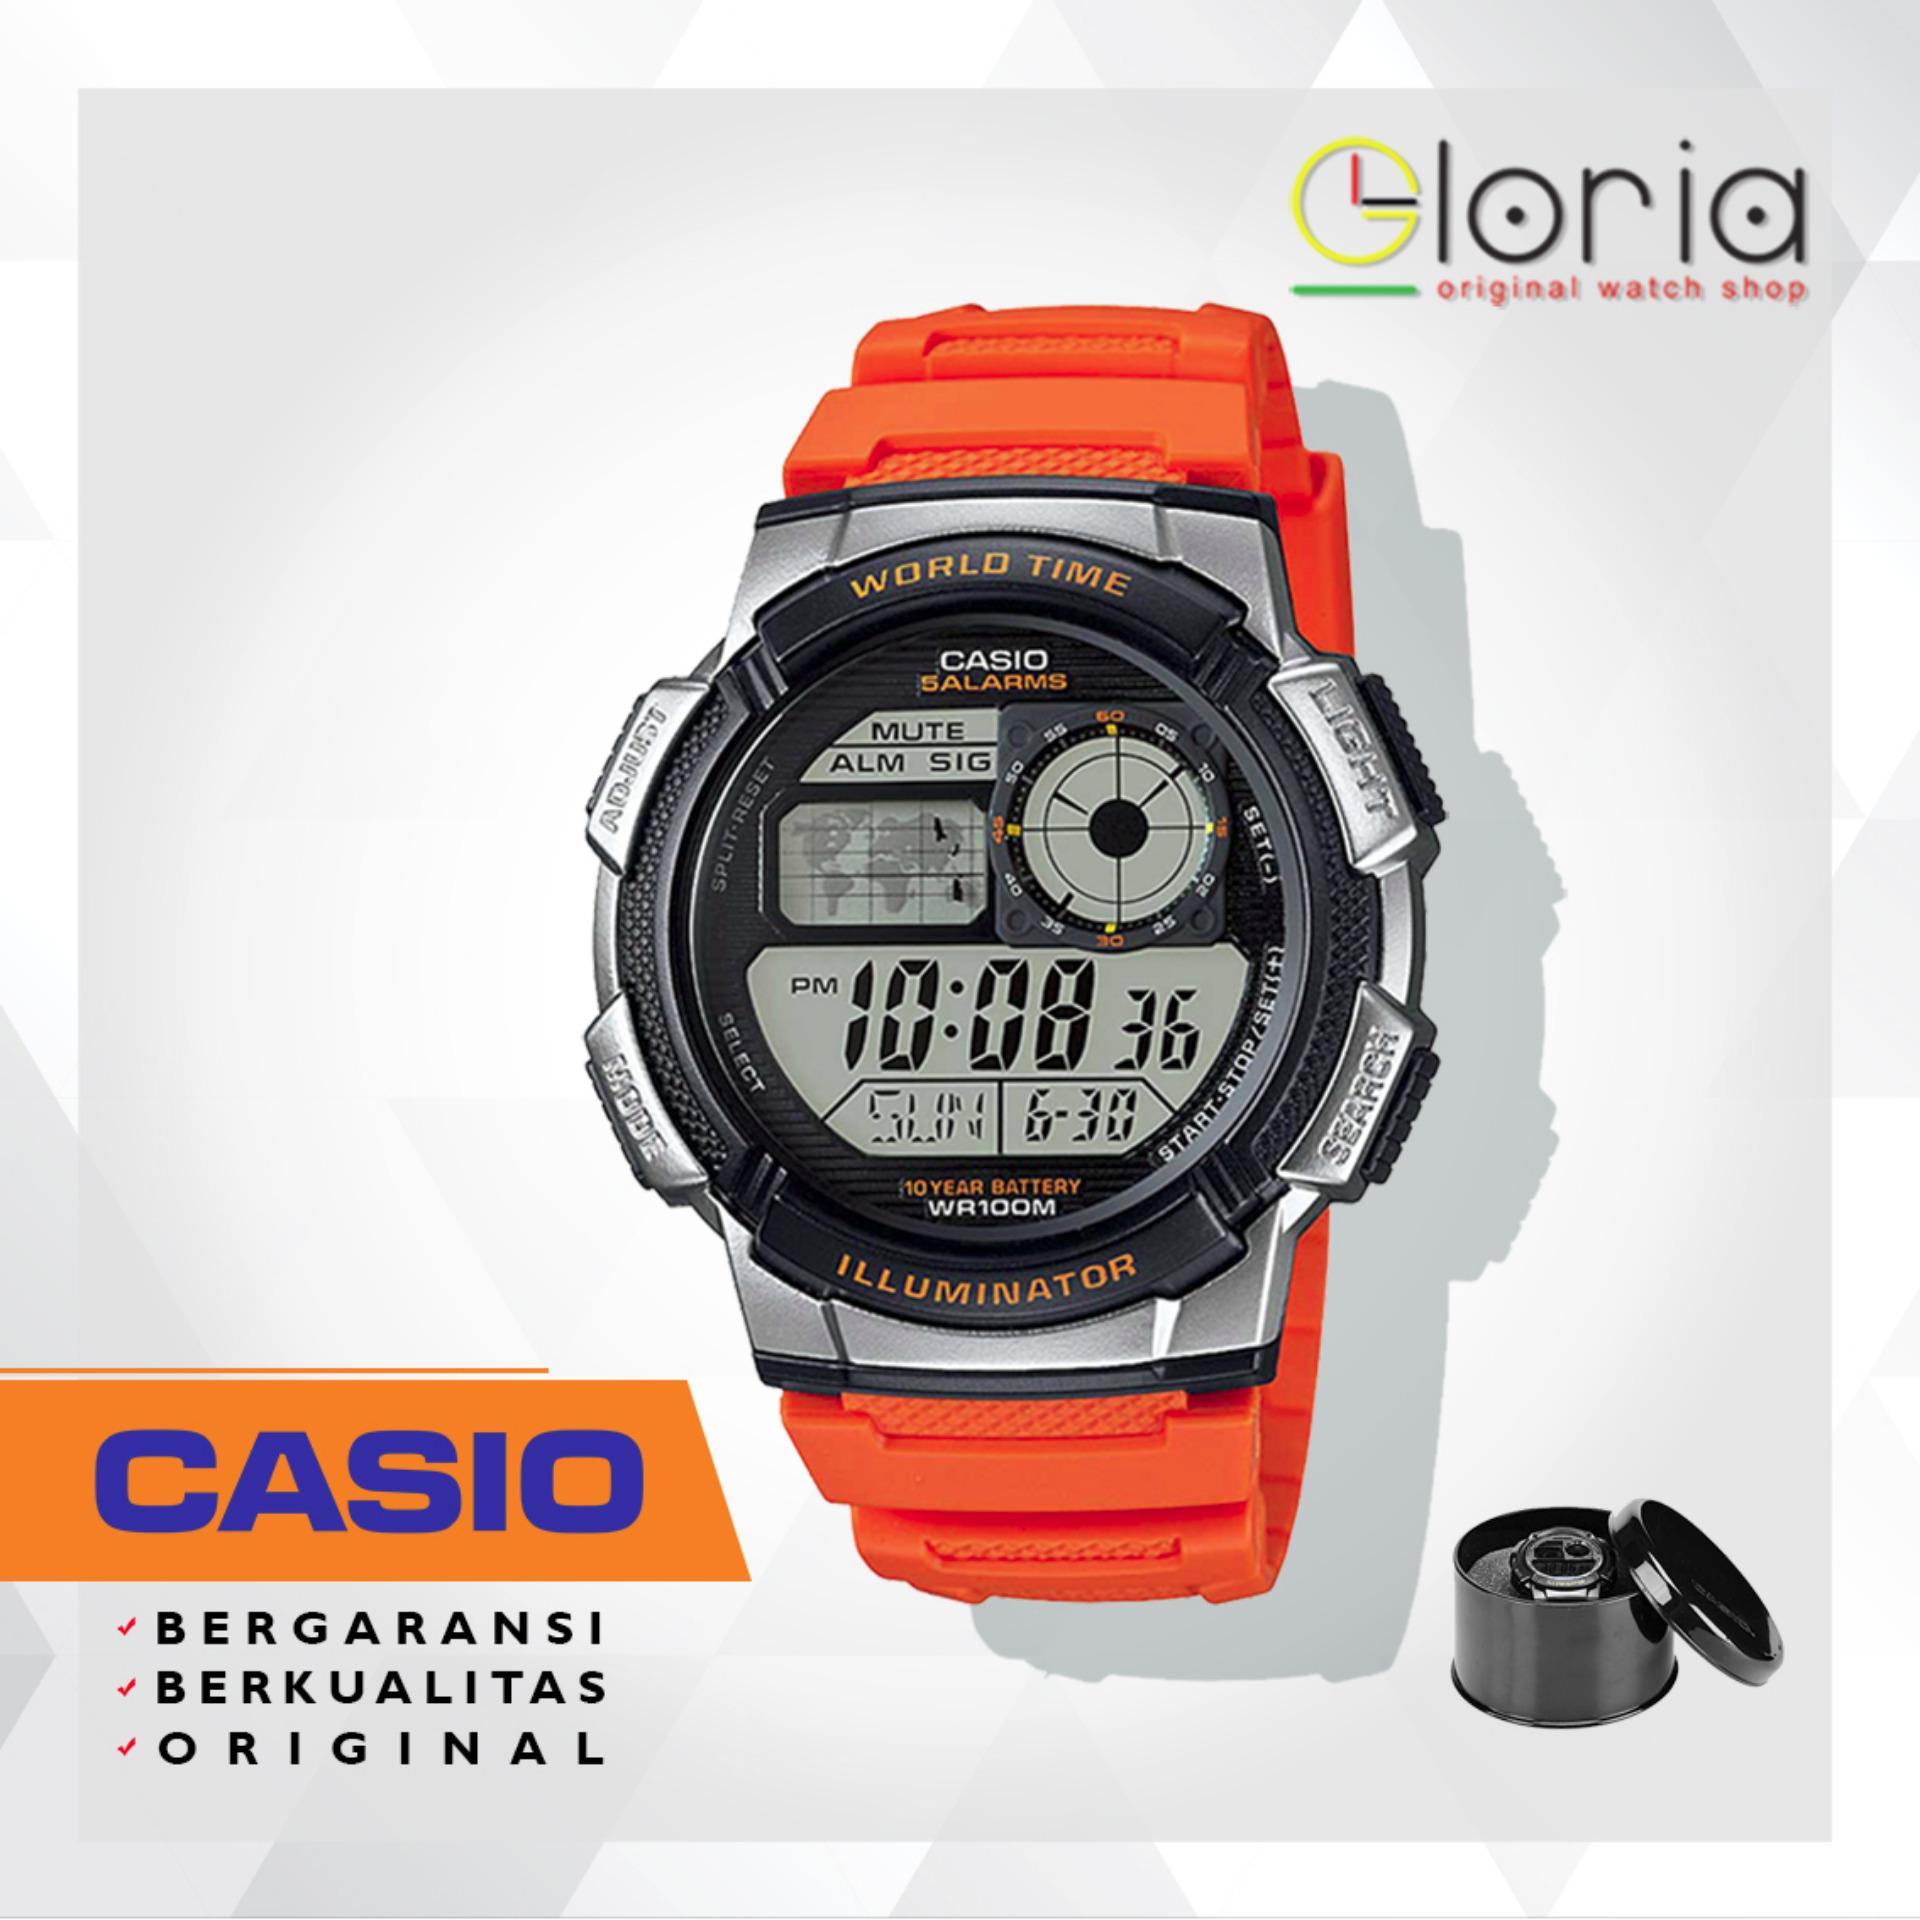 Casio AE 1100WD 1AVDF Jam Tangan Pria Silver Stainless 3 . Source · CASIO Illuminator AE